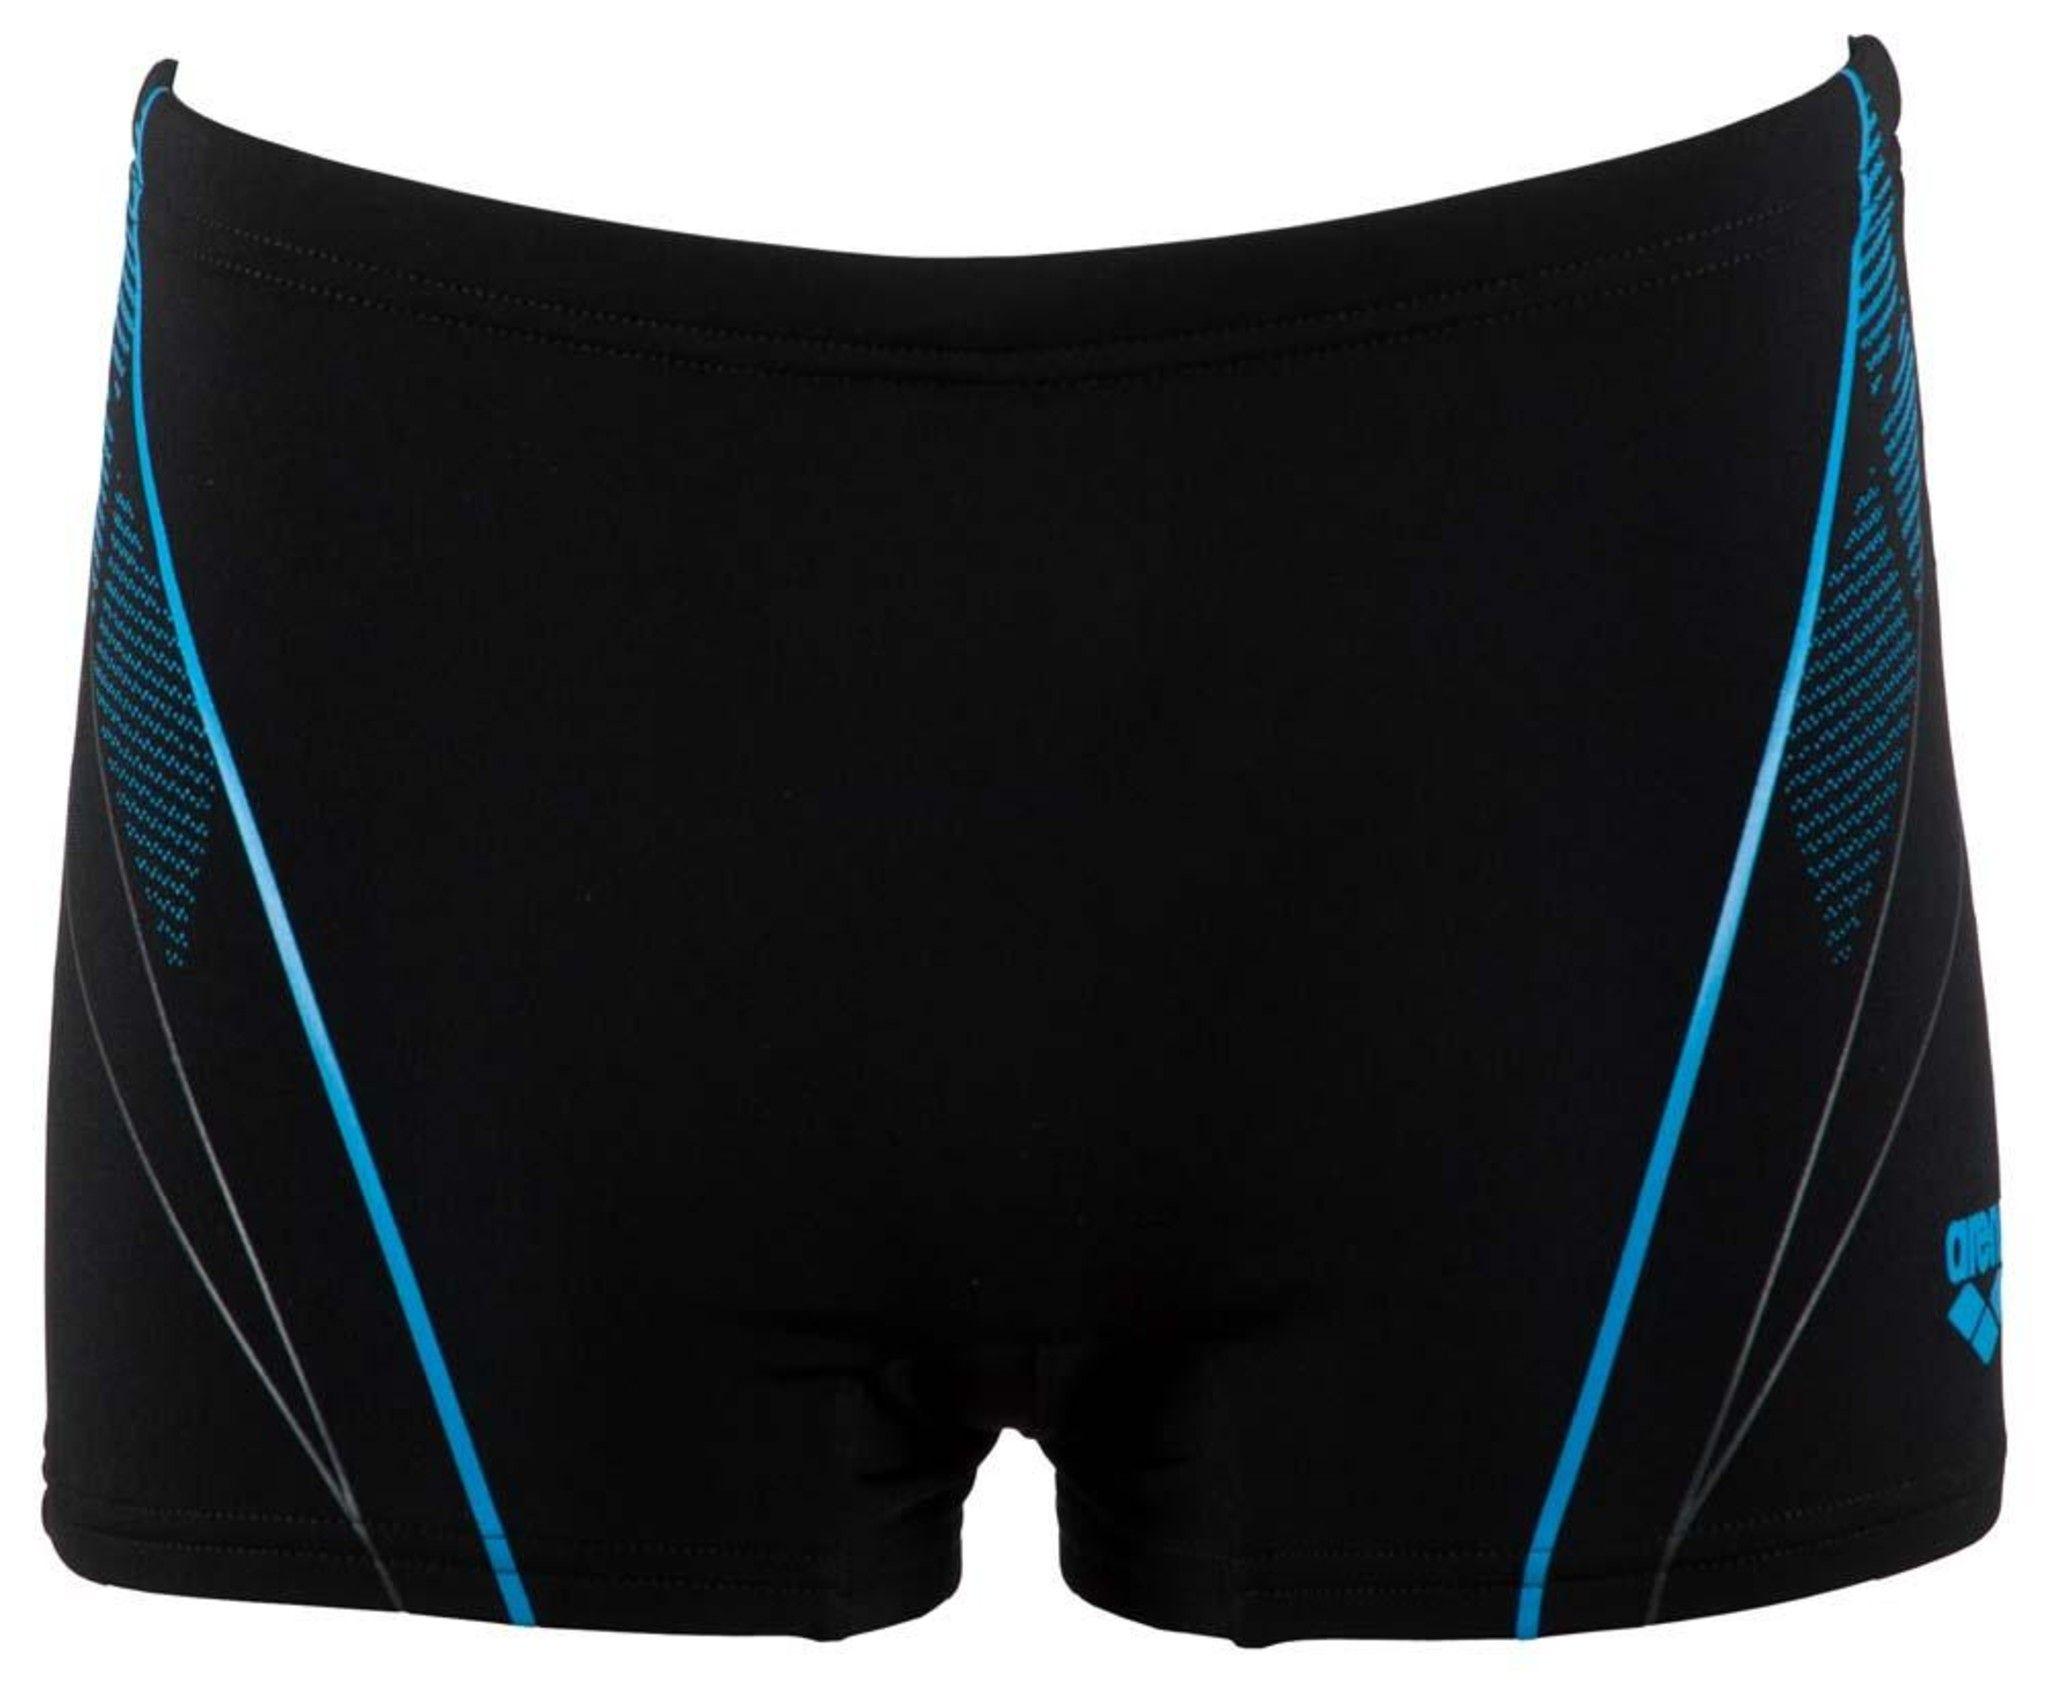 Costume uomo arena 1a42258 piscina shop online sport club costa volpino - Costume intero uomo piscina ...